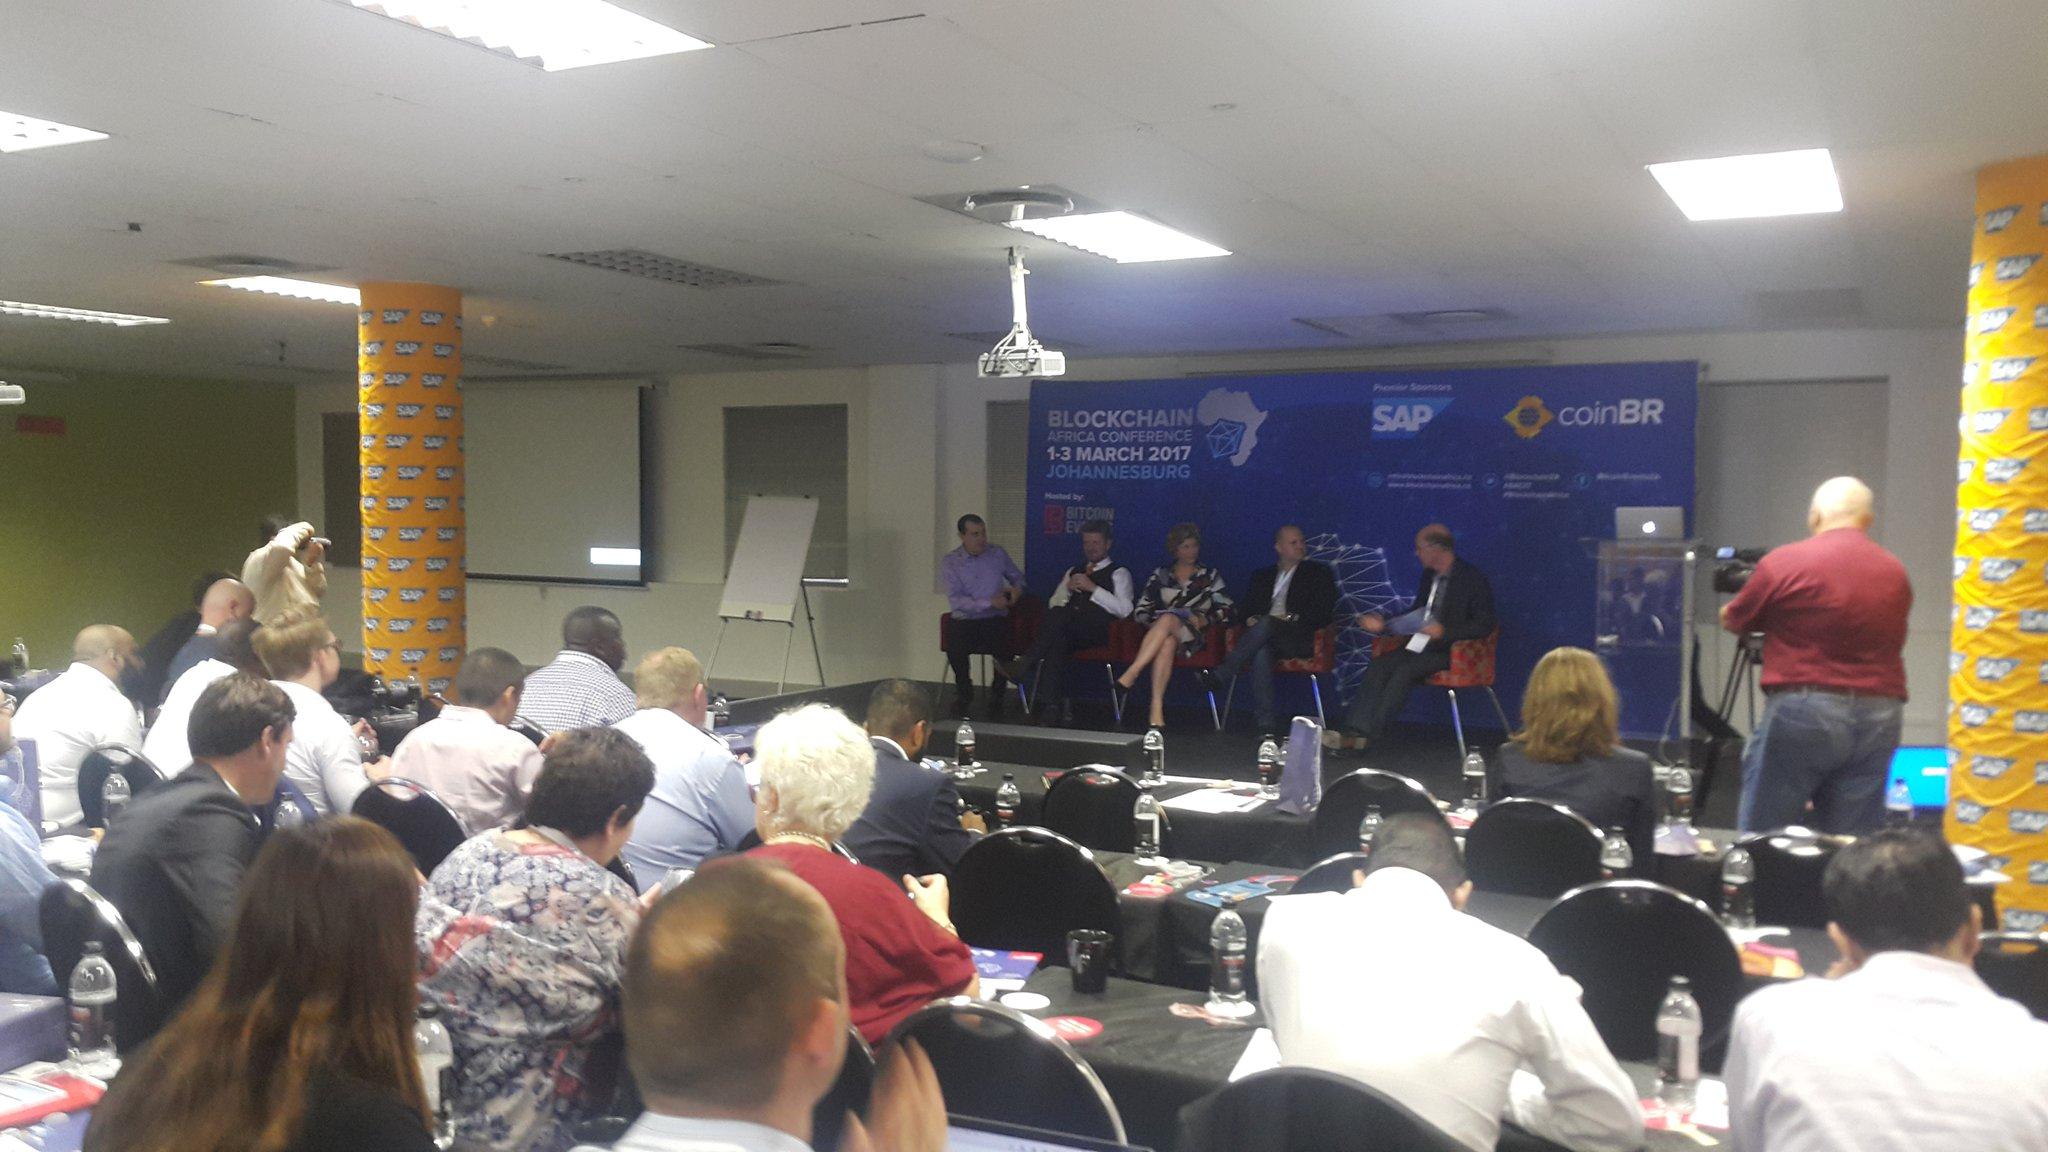 Blockchain Technology Opportunities Panel with @aantonop @LlewClaasen @blockchainza #BAC17 https://t.co/TtHcHmDhvz